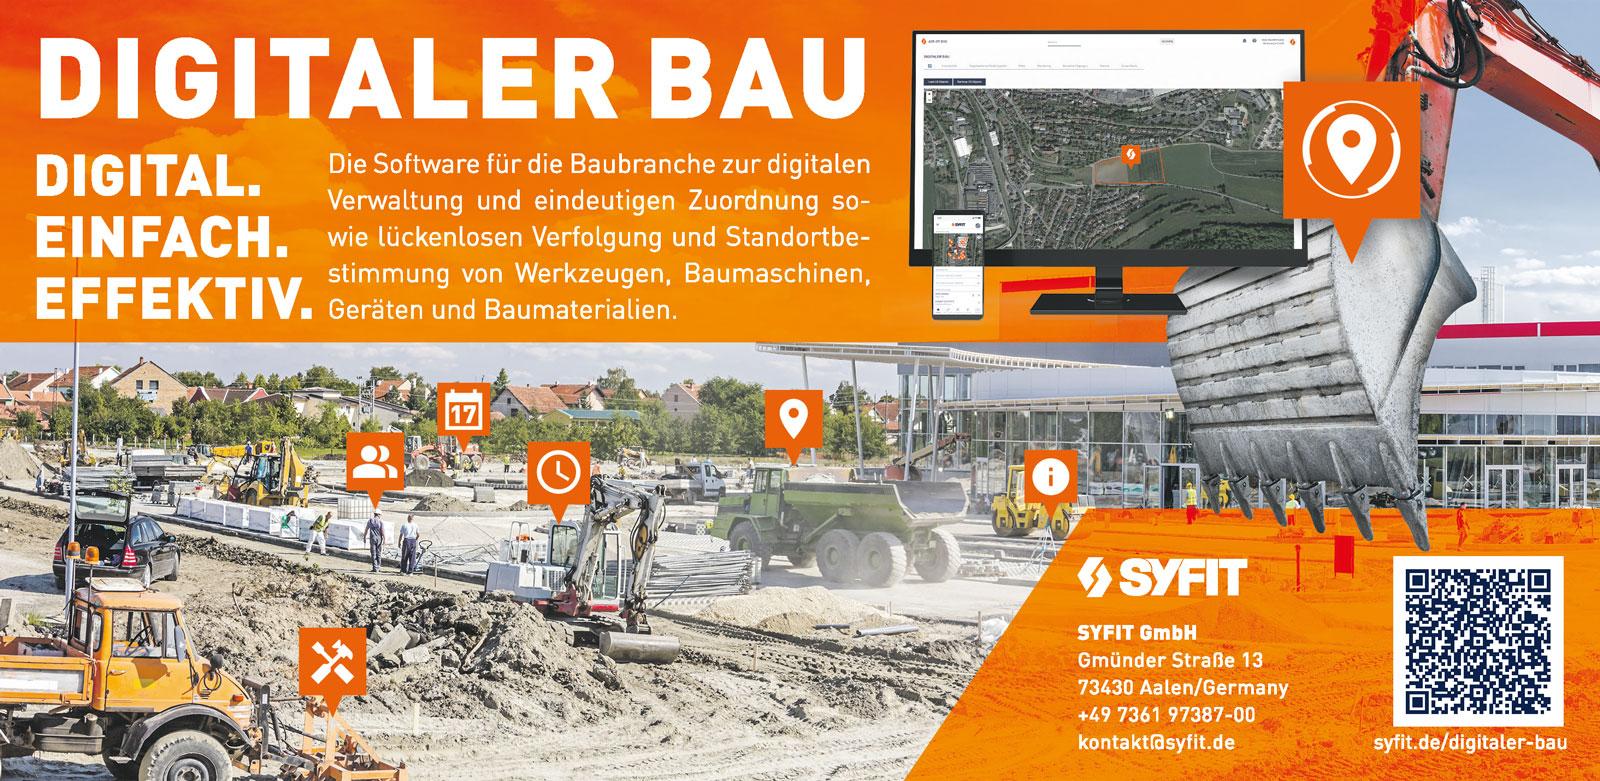 Anzeige Digitaler Bau